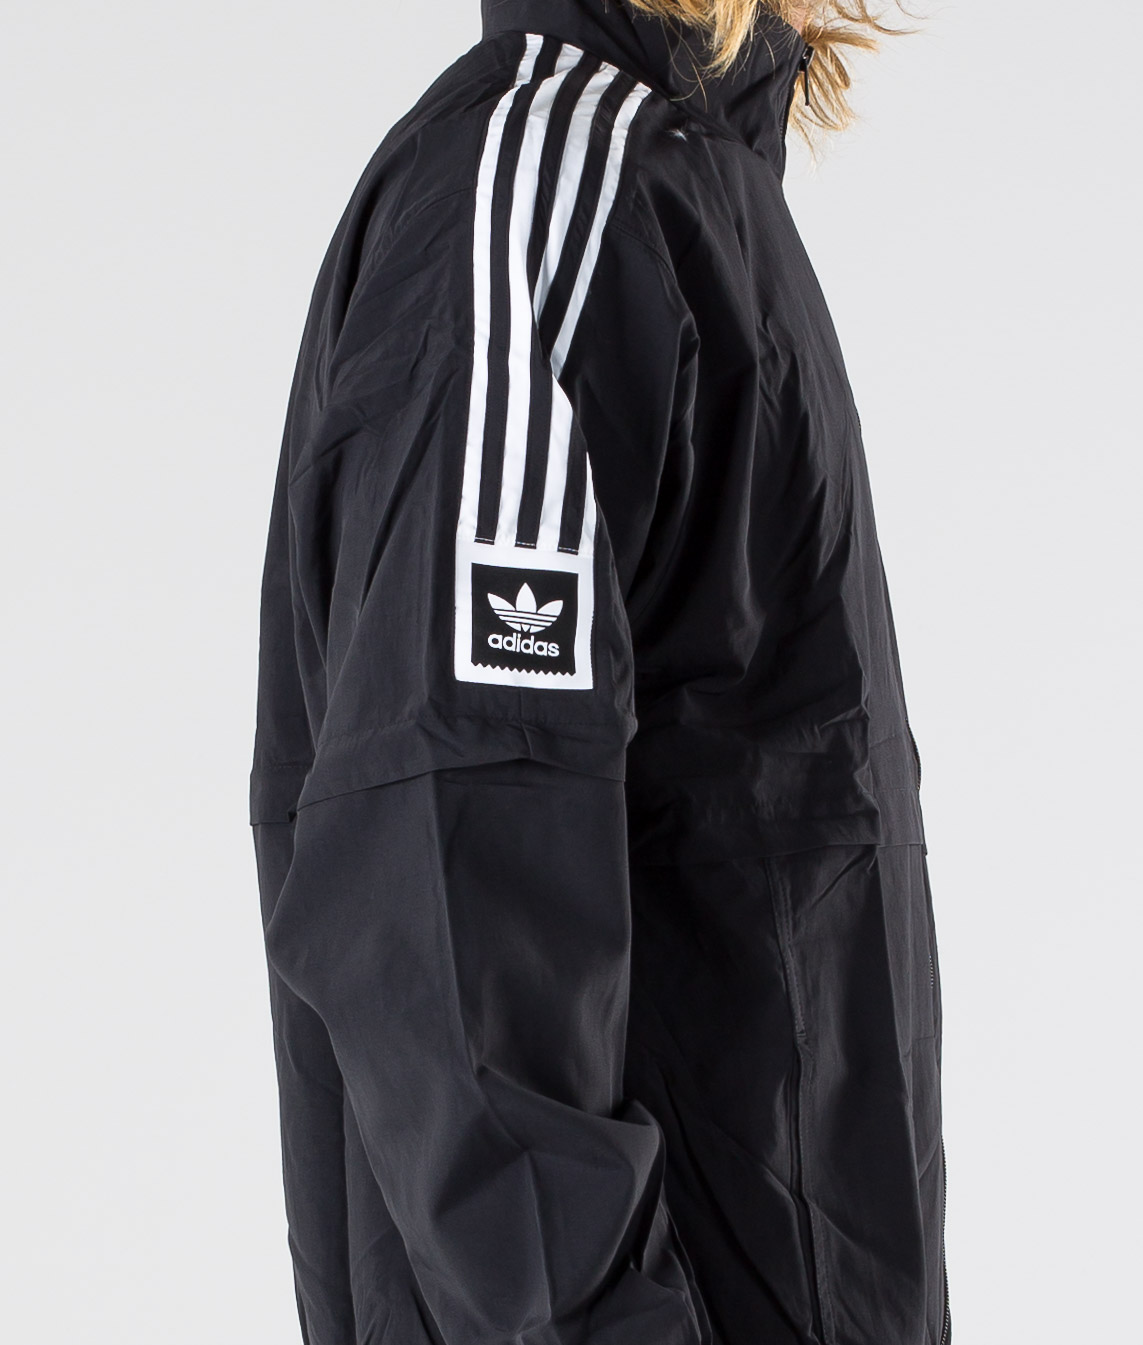 adidas Skateboarding Standard 20 Jacket Black | ZUPPORT